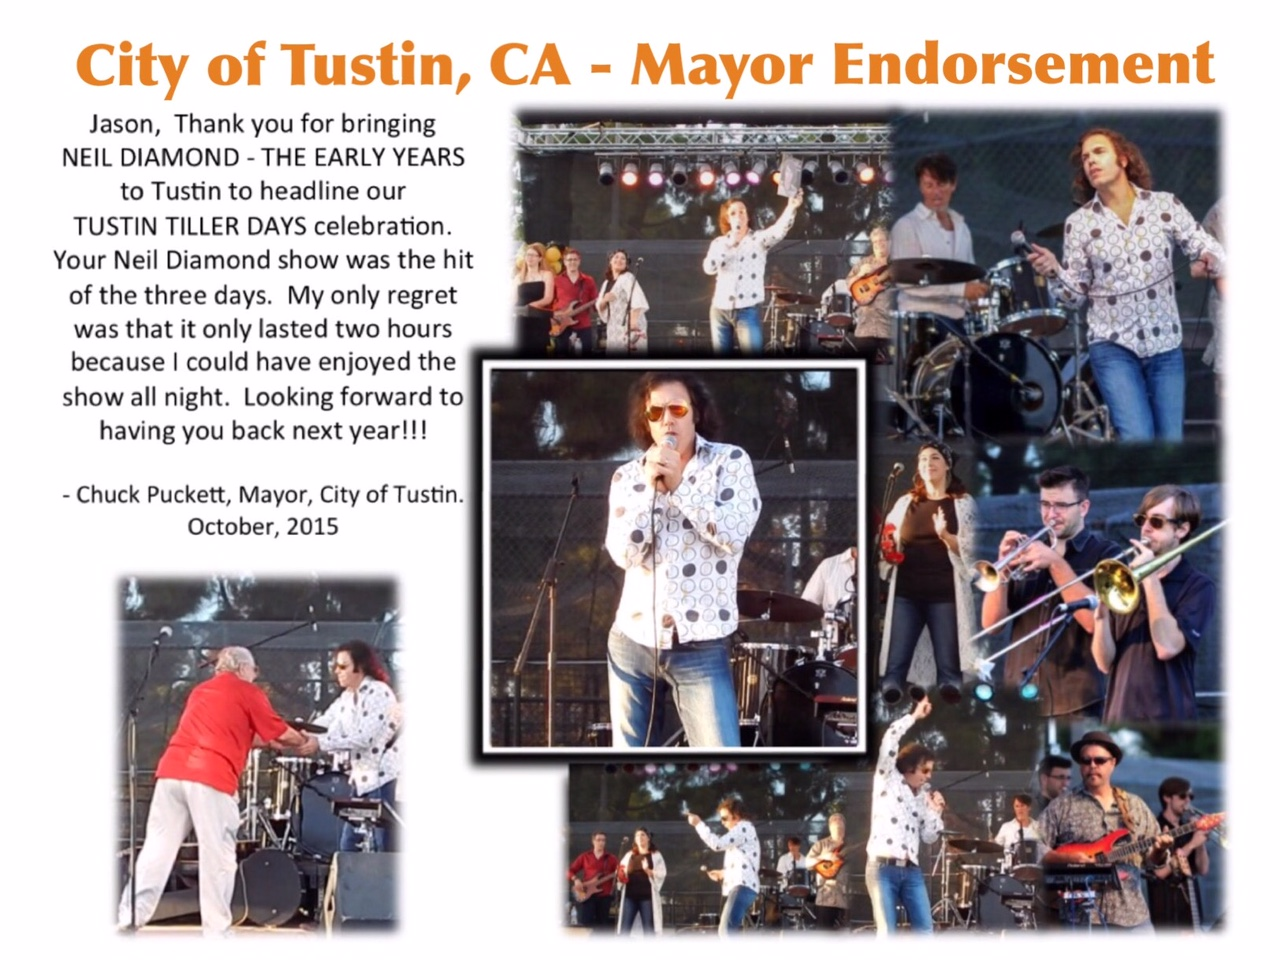 Neil Diamond - The Early Years - Mayor of Tustin Endorsement